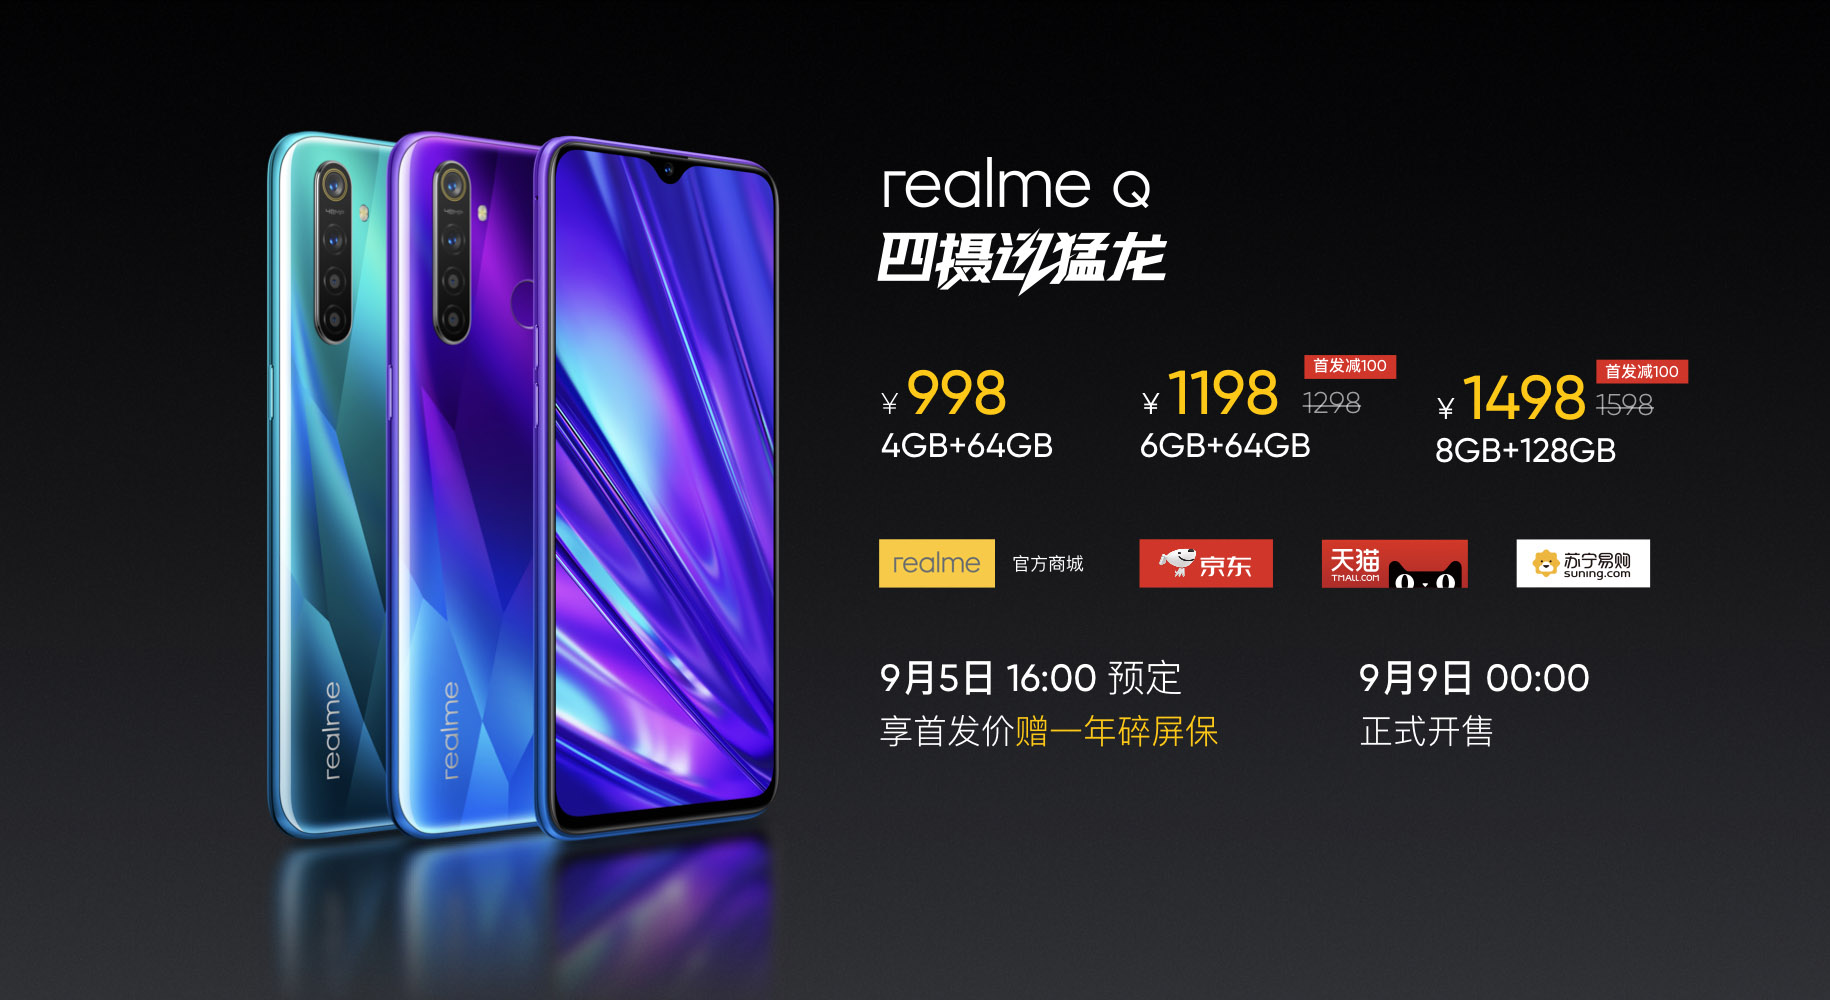 RealmeQ正式发布,998起锤爆红米Note8与荣耀Play3,新一代千元真香机诞生!